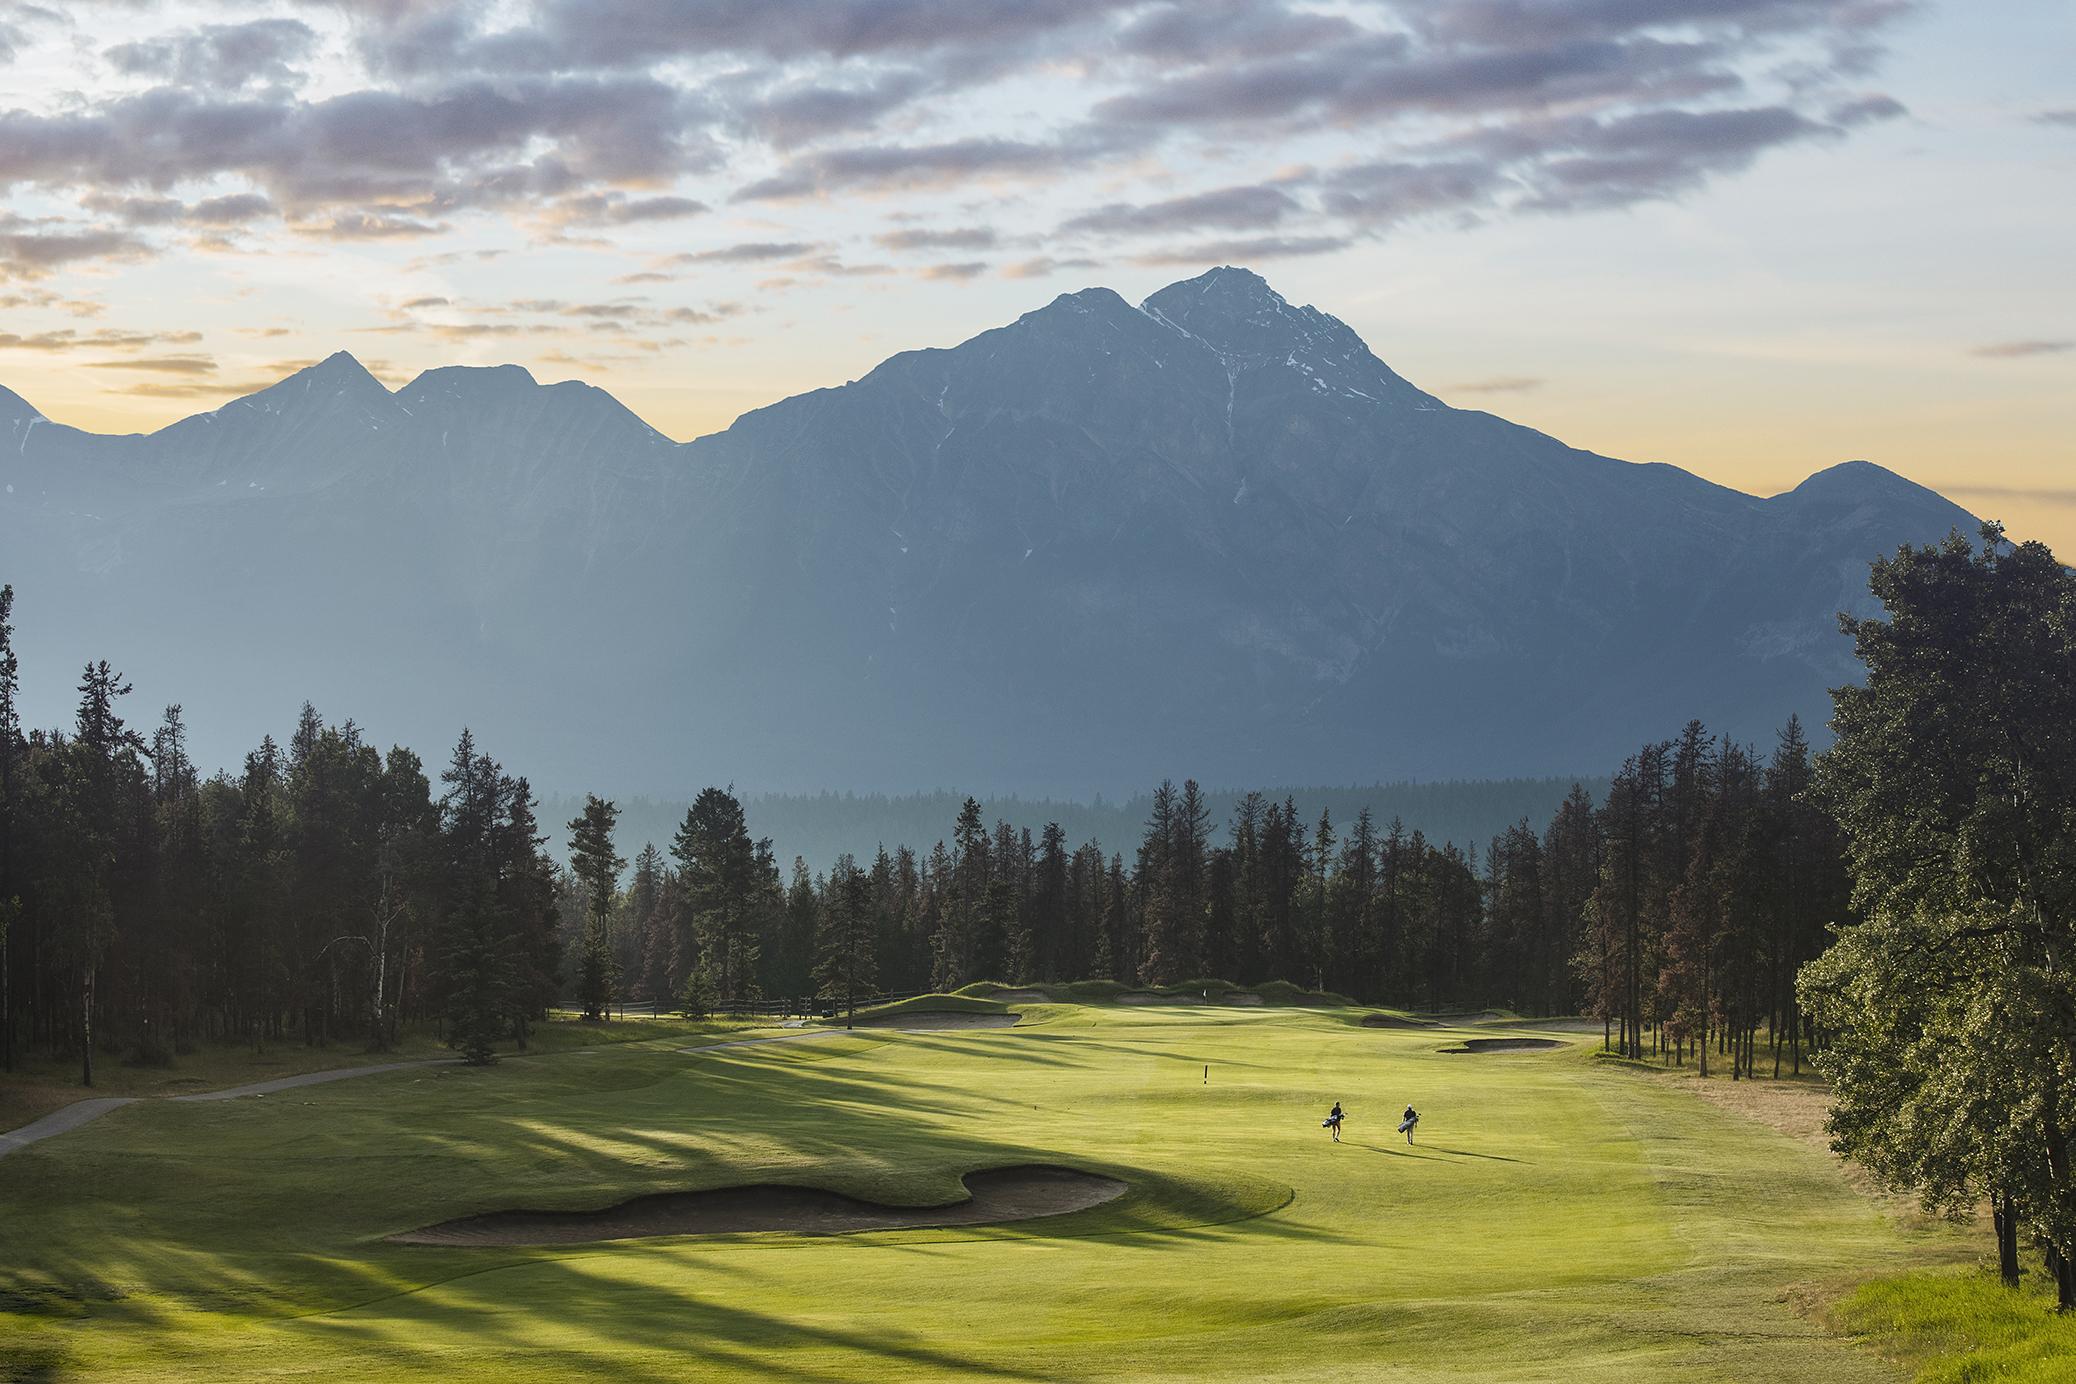 Hole 11 - Pyramid - Golfers at Sunset